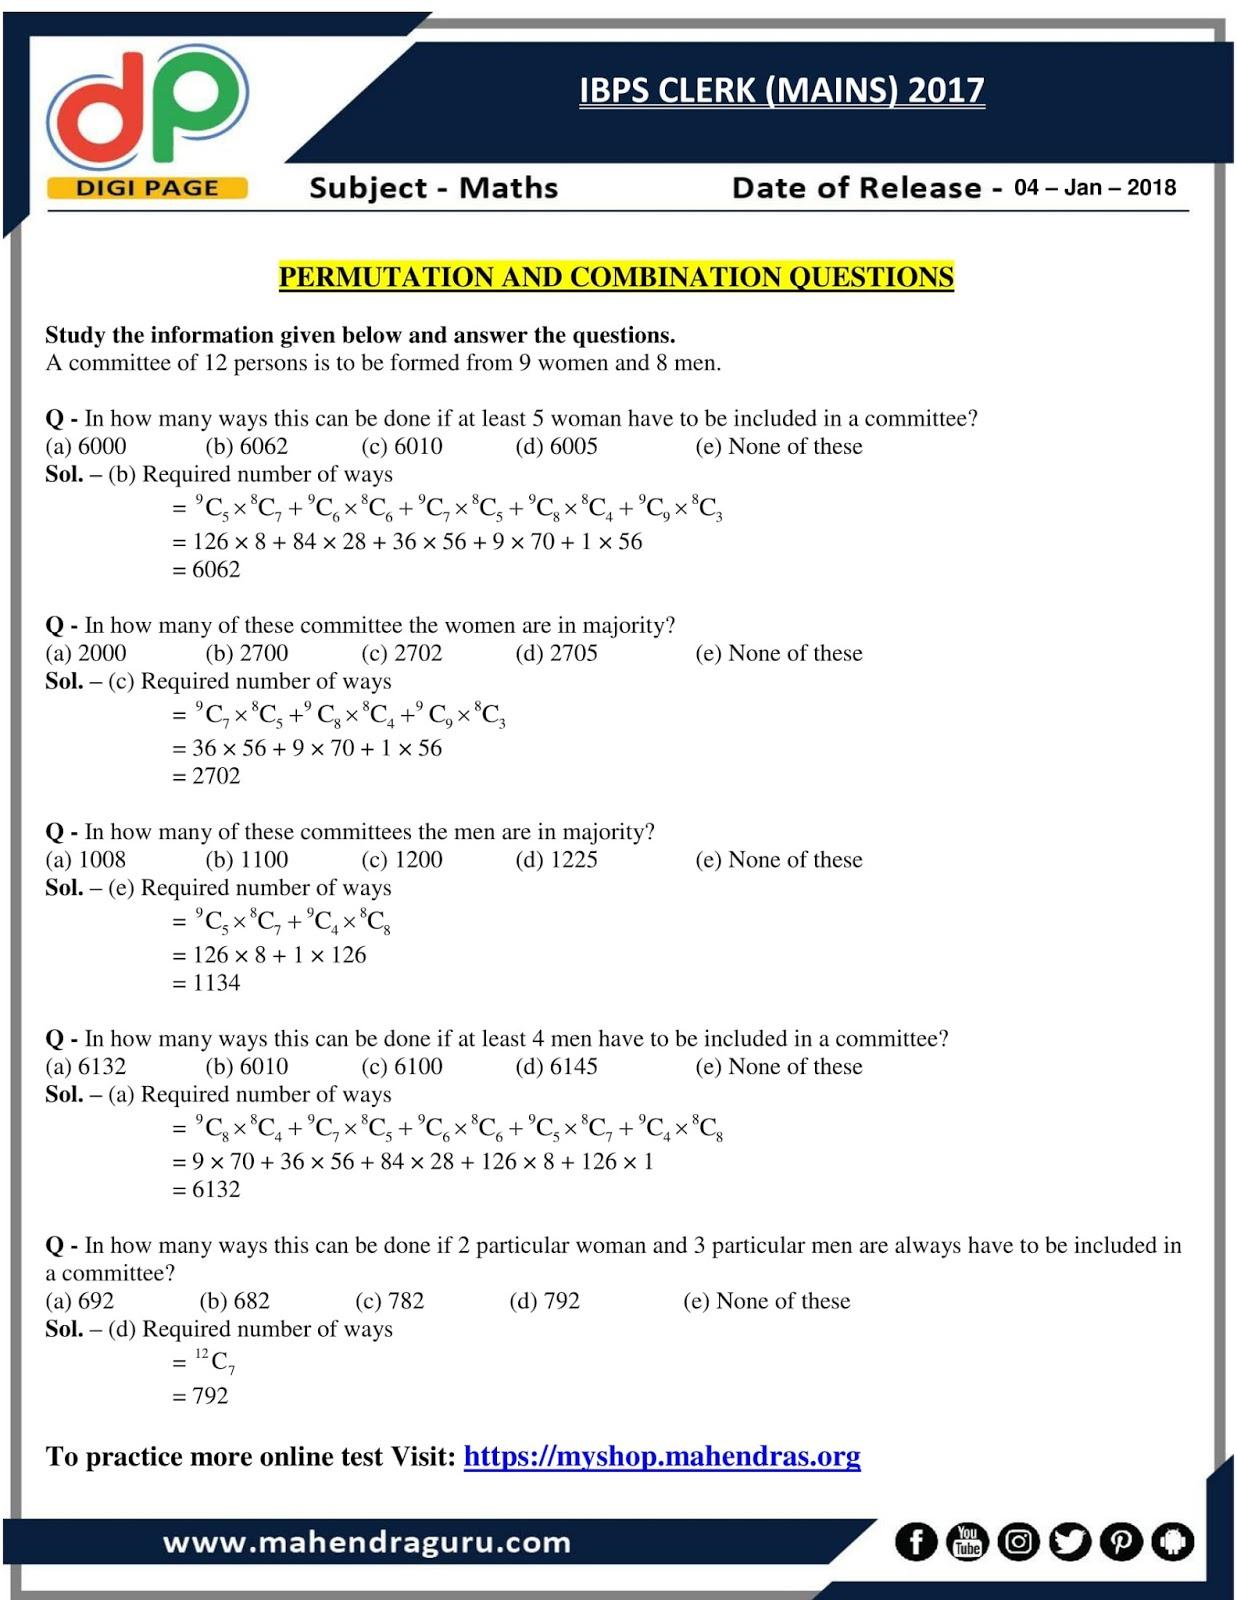 Permutation and combination tricks for bank exams pdf printer